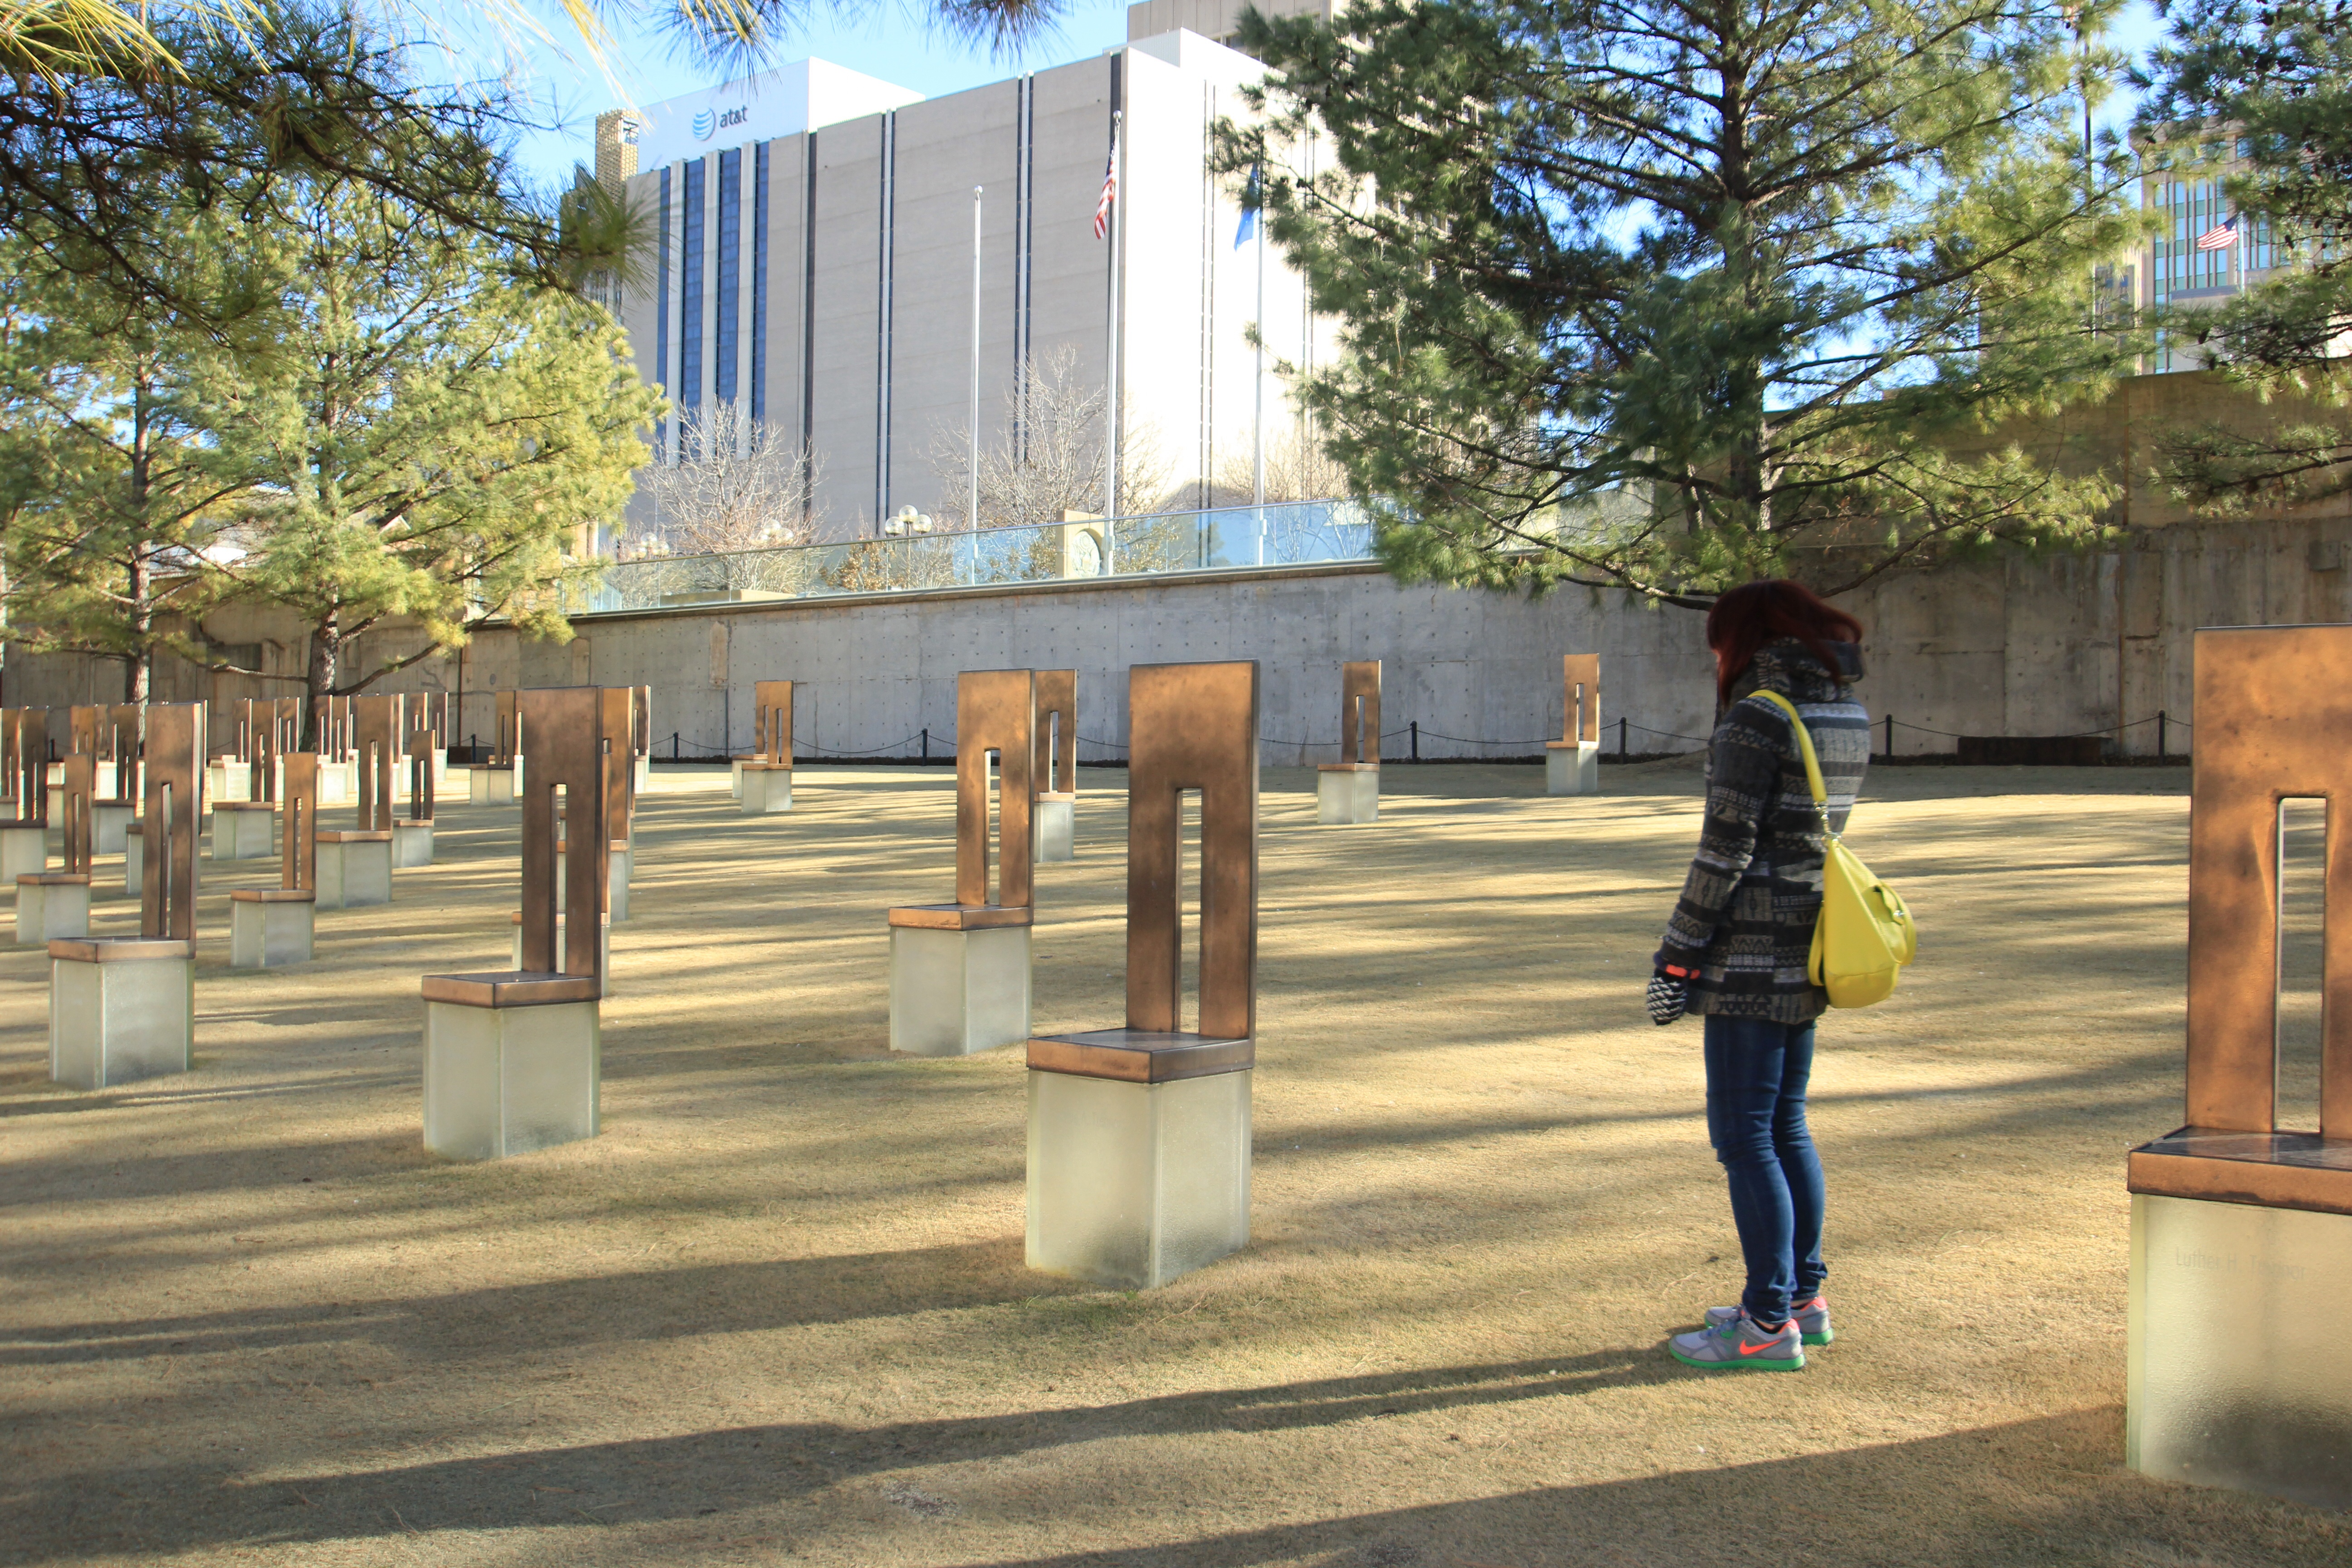 Oklahoma City Memorial www.mytributejournal.com